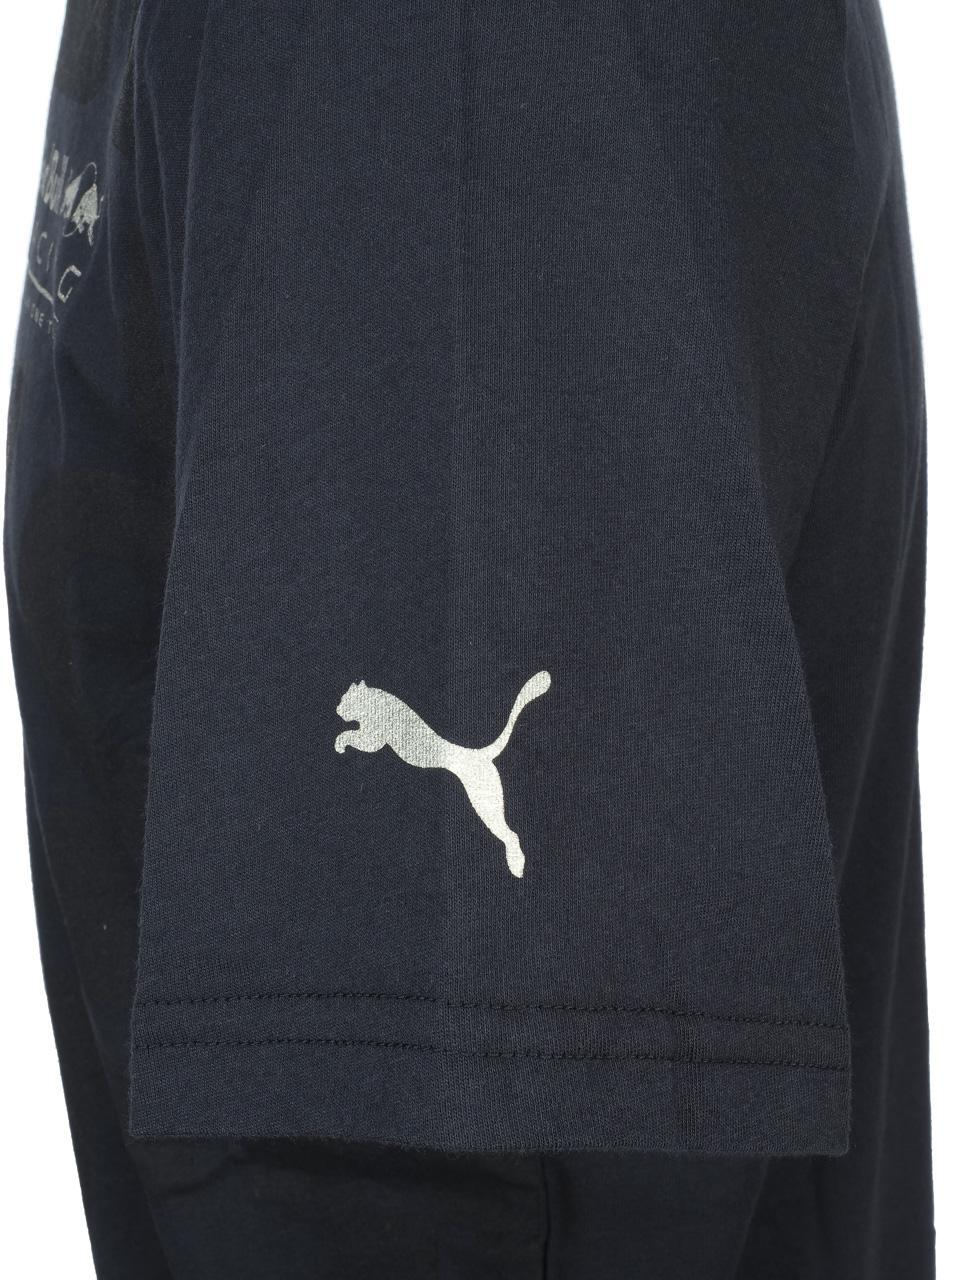 Short-Sleeve-T-Shirt-Puma-Rbr-Race-Navy-Mc-Tee-Blue-44570-New thumbnail 3